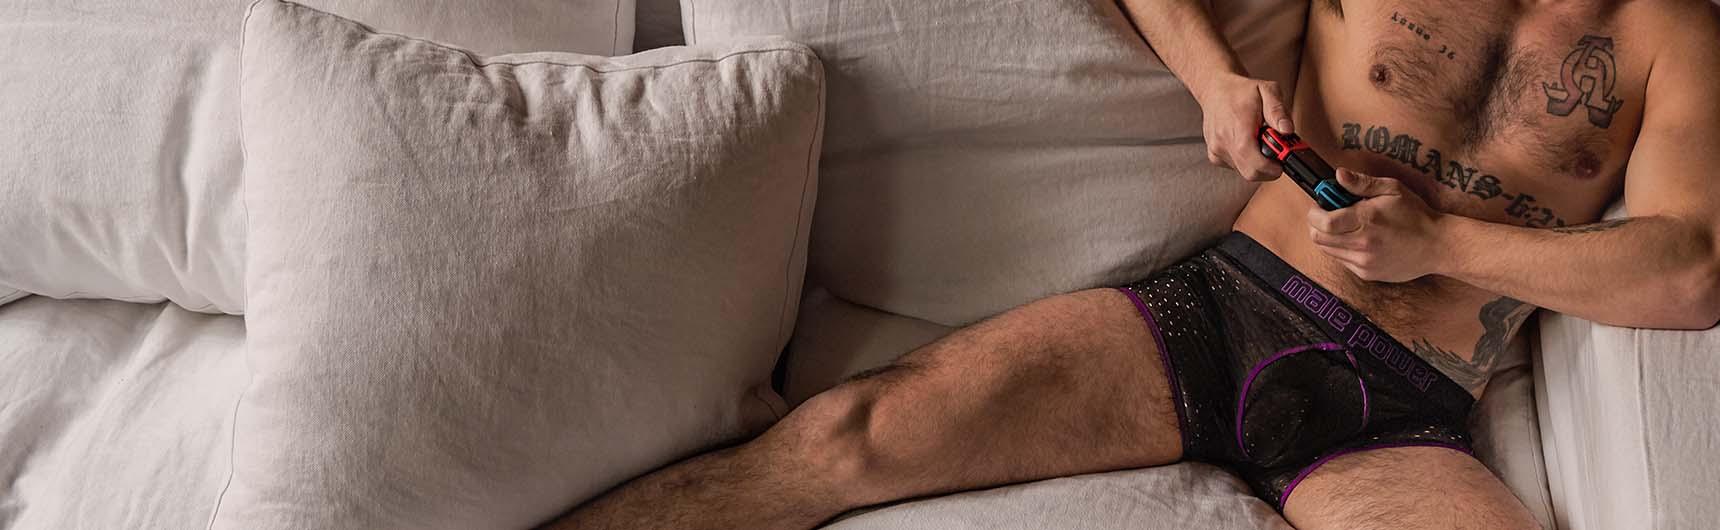 mens sexy sheer lingerie boxer brief underwear